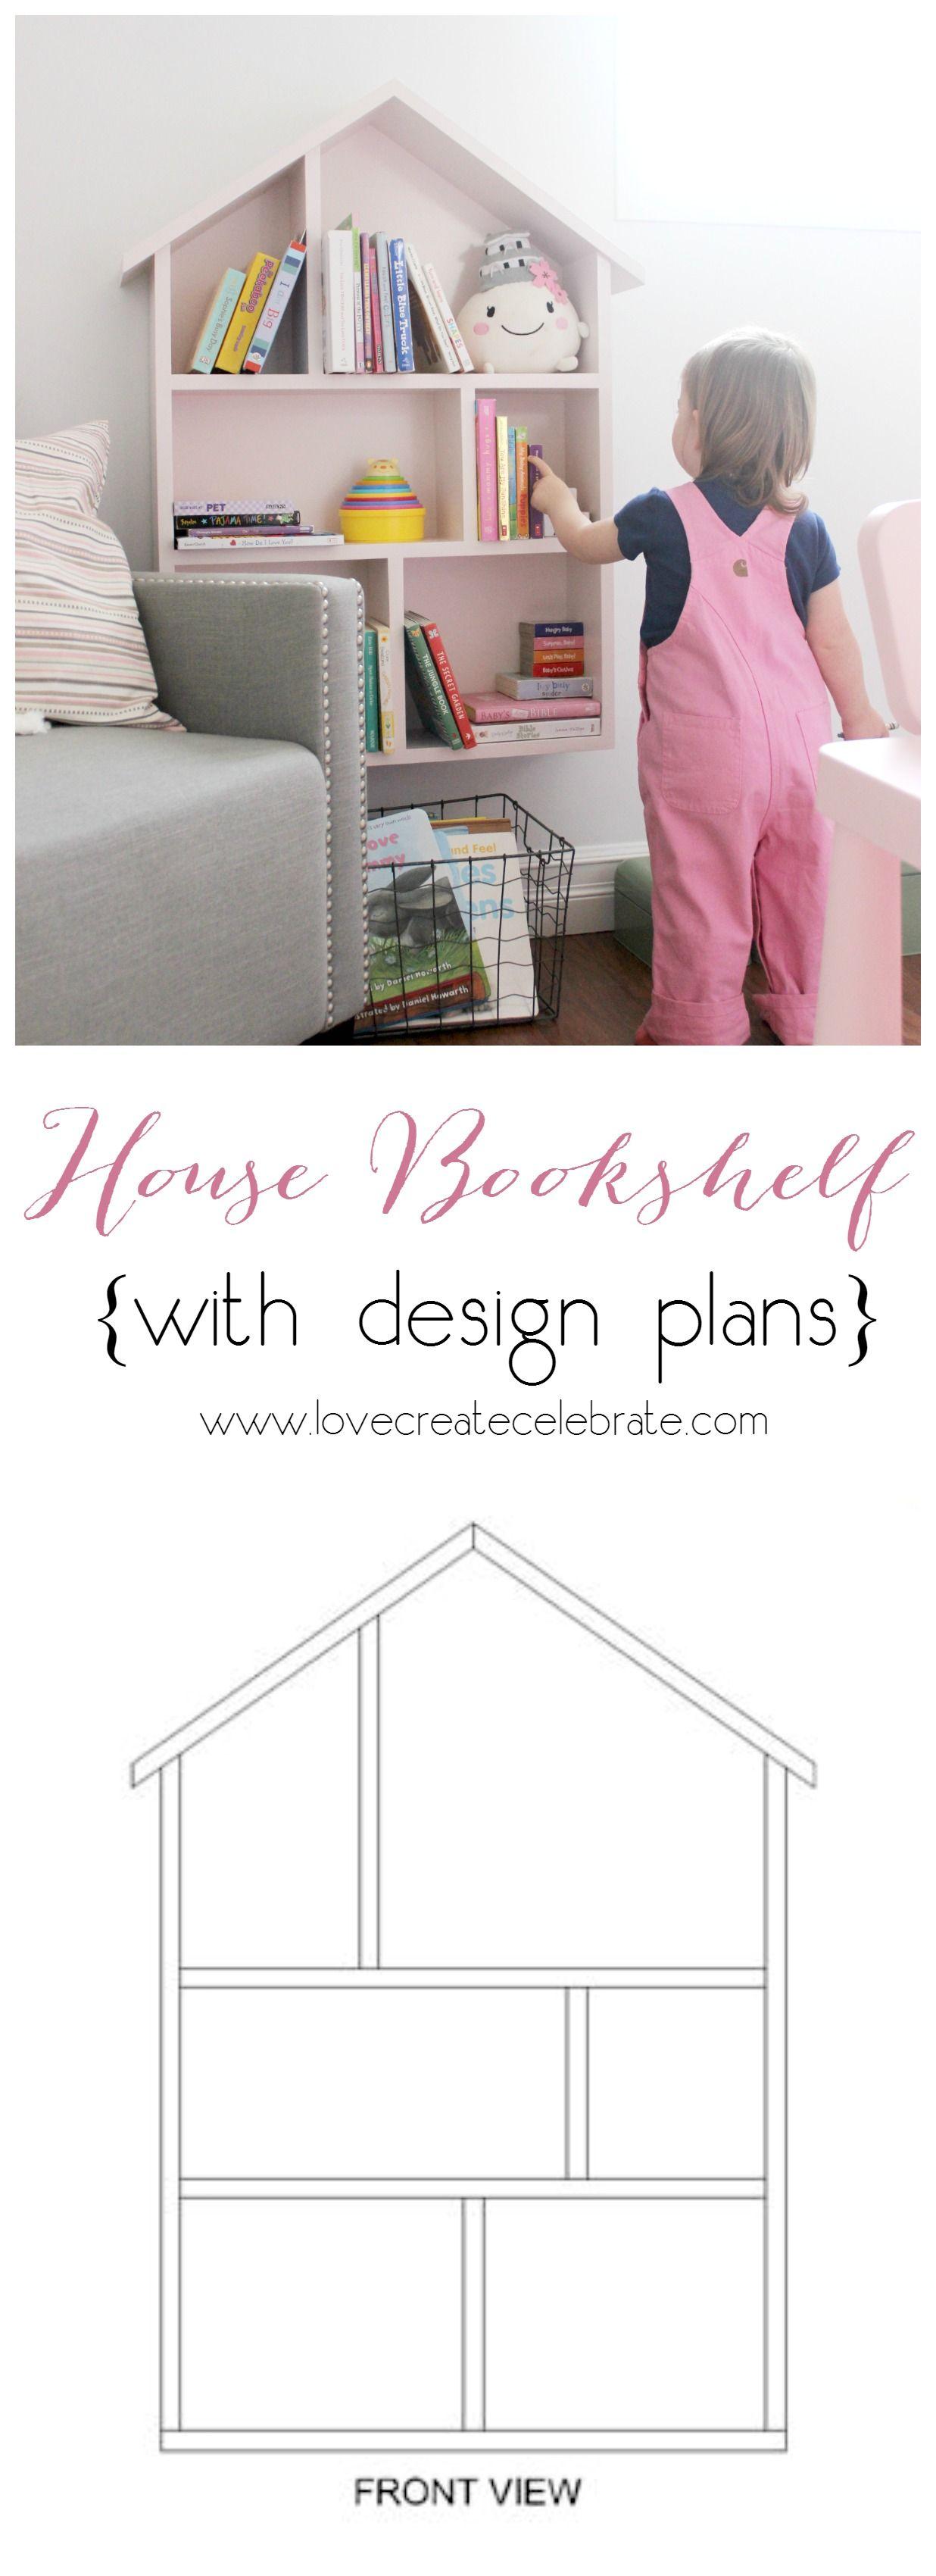 creative ideas mounted decor children organization furniture home bedroom plans storage area kids for design book beautiful bookshelf s wall